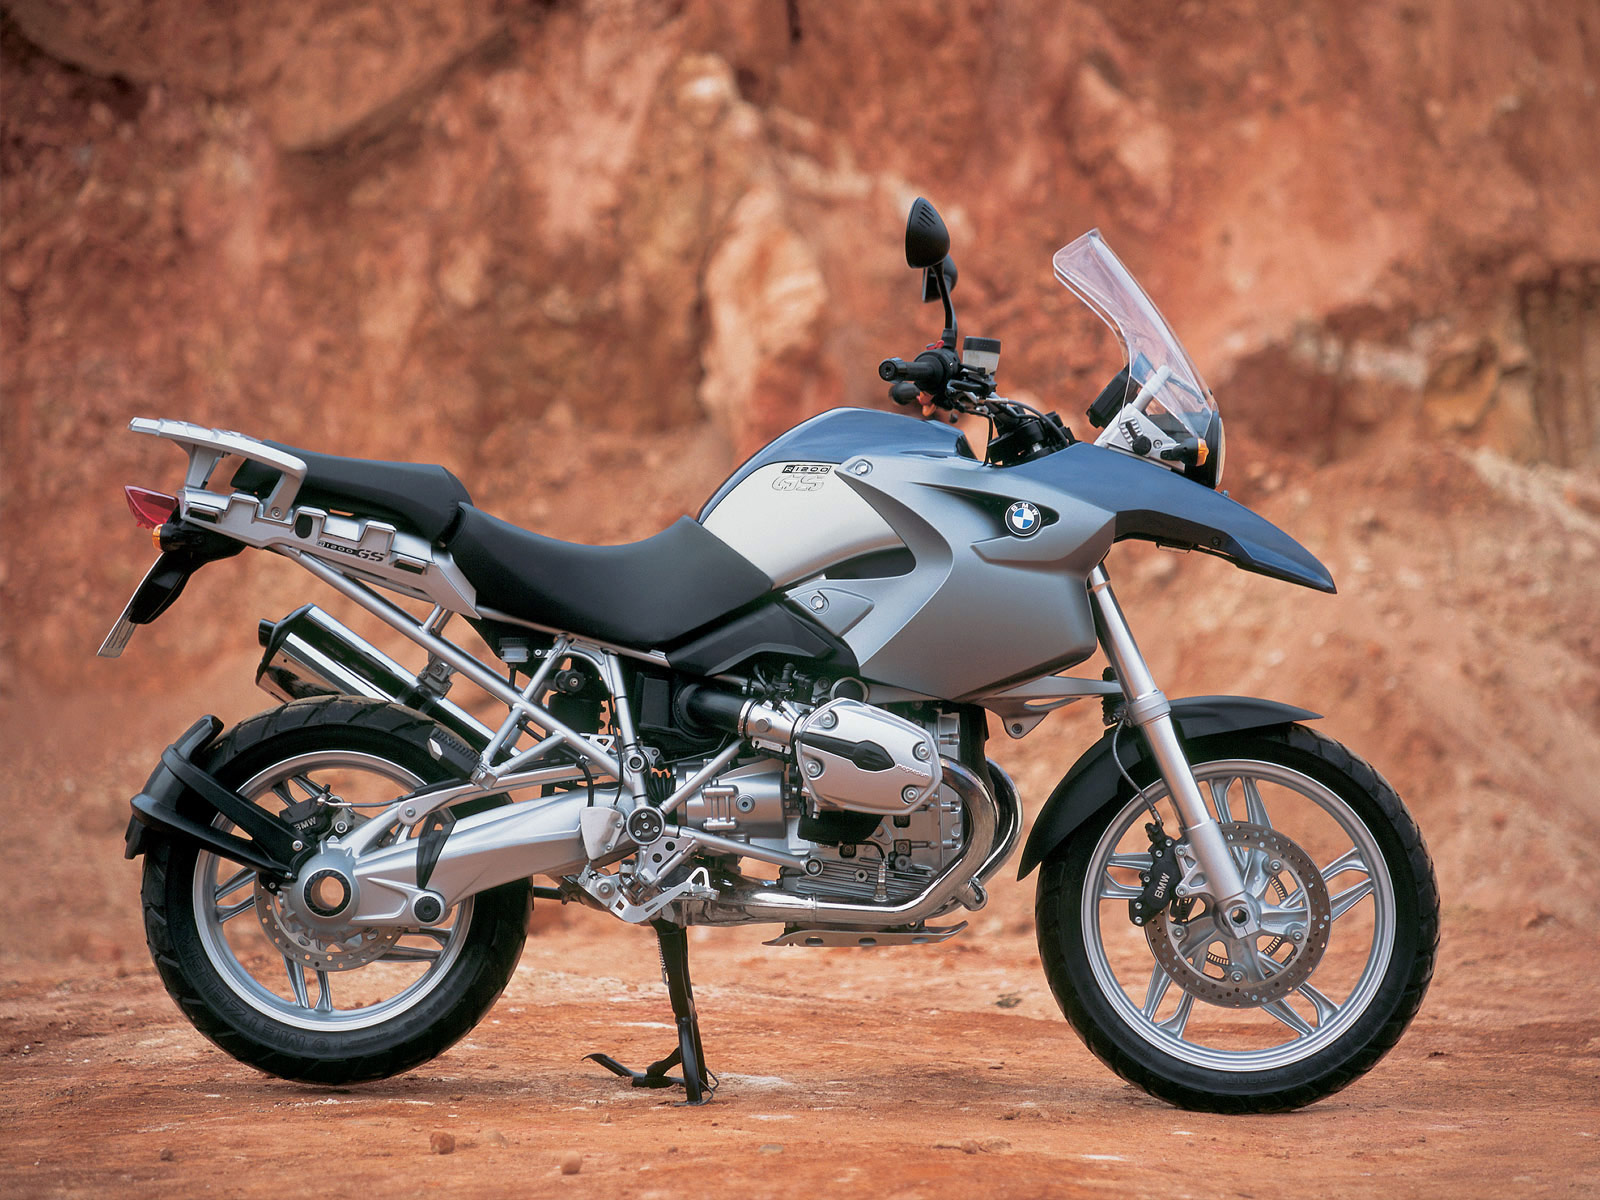 bmw r 1200 gs motorcycle desktop wallpaper accident. Black Bedroom Furniture Sets. Home Design Ideas